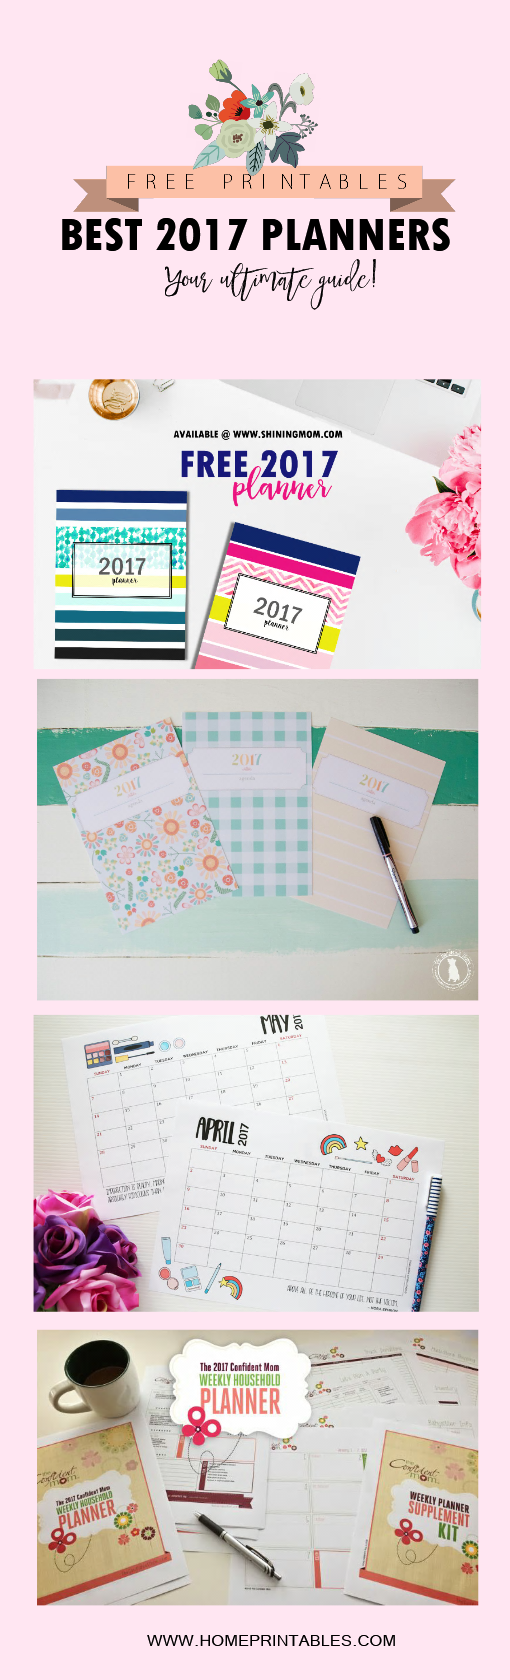 2017 free planner printables